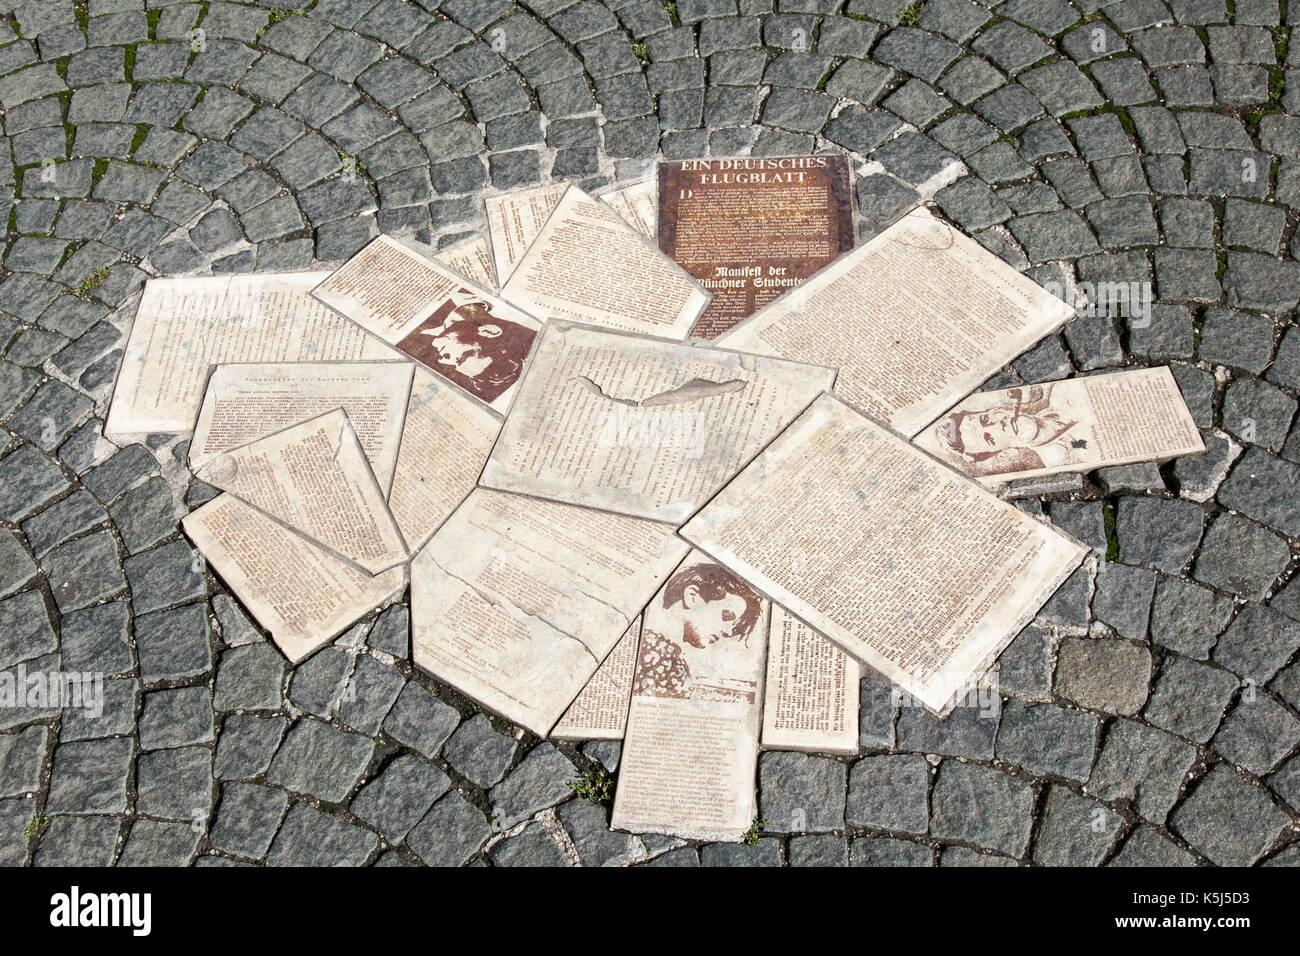 White Rose Pavement Memorial, Munich - Stock Image